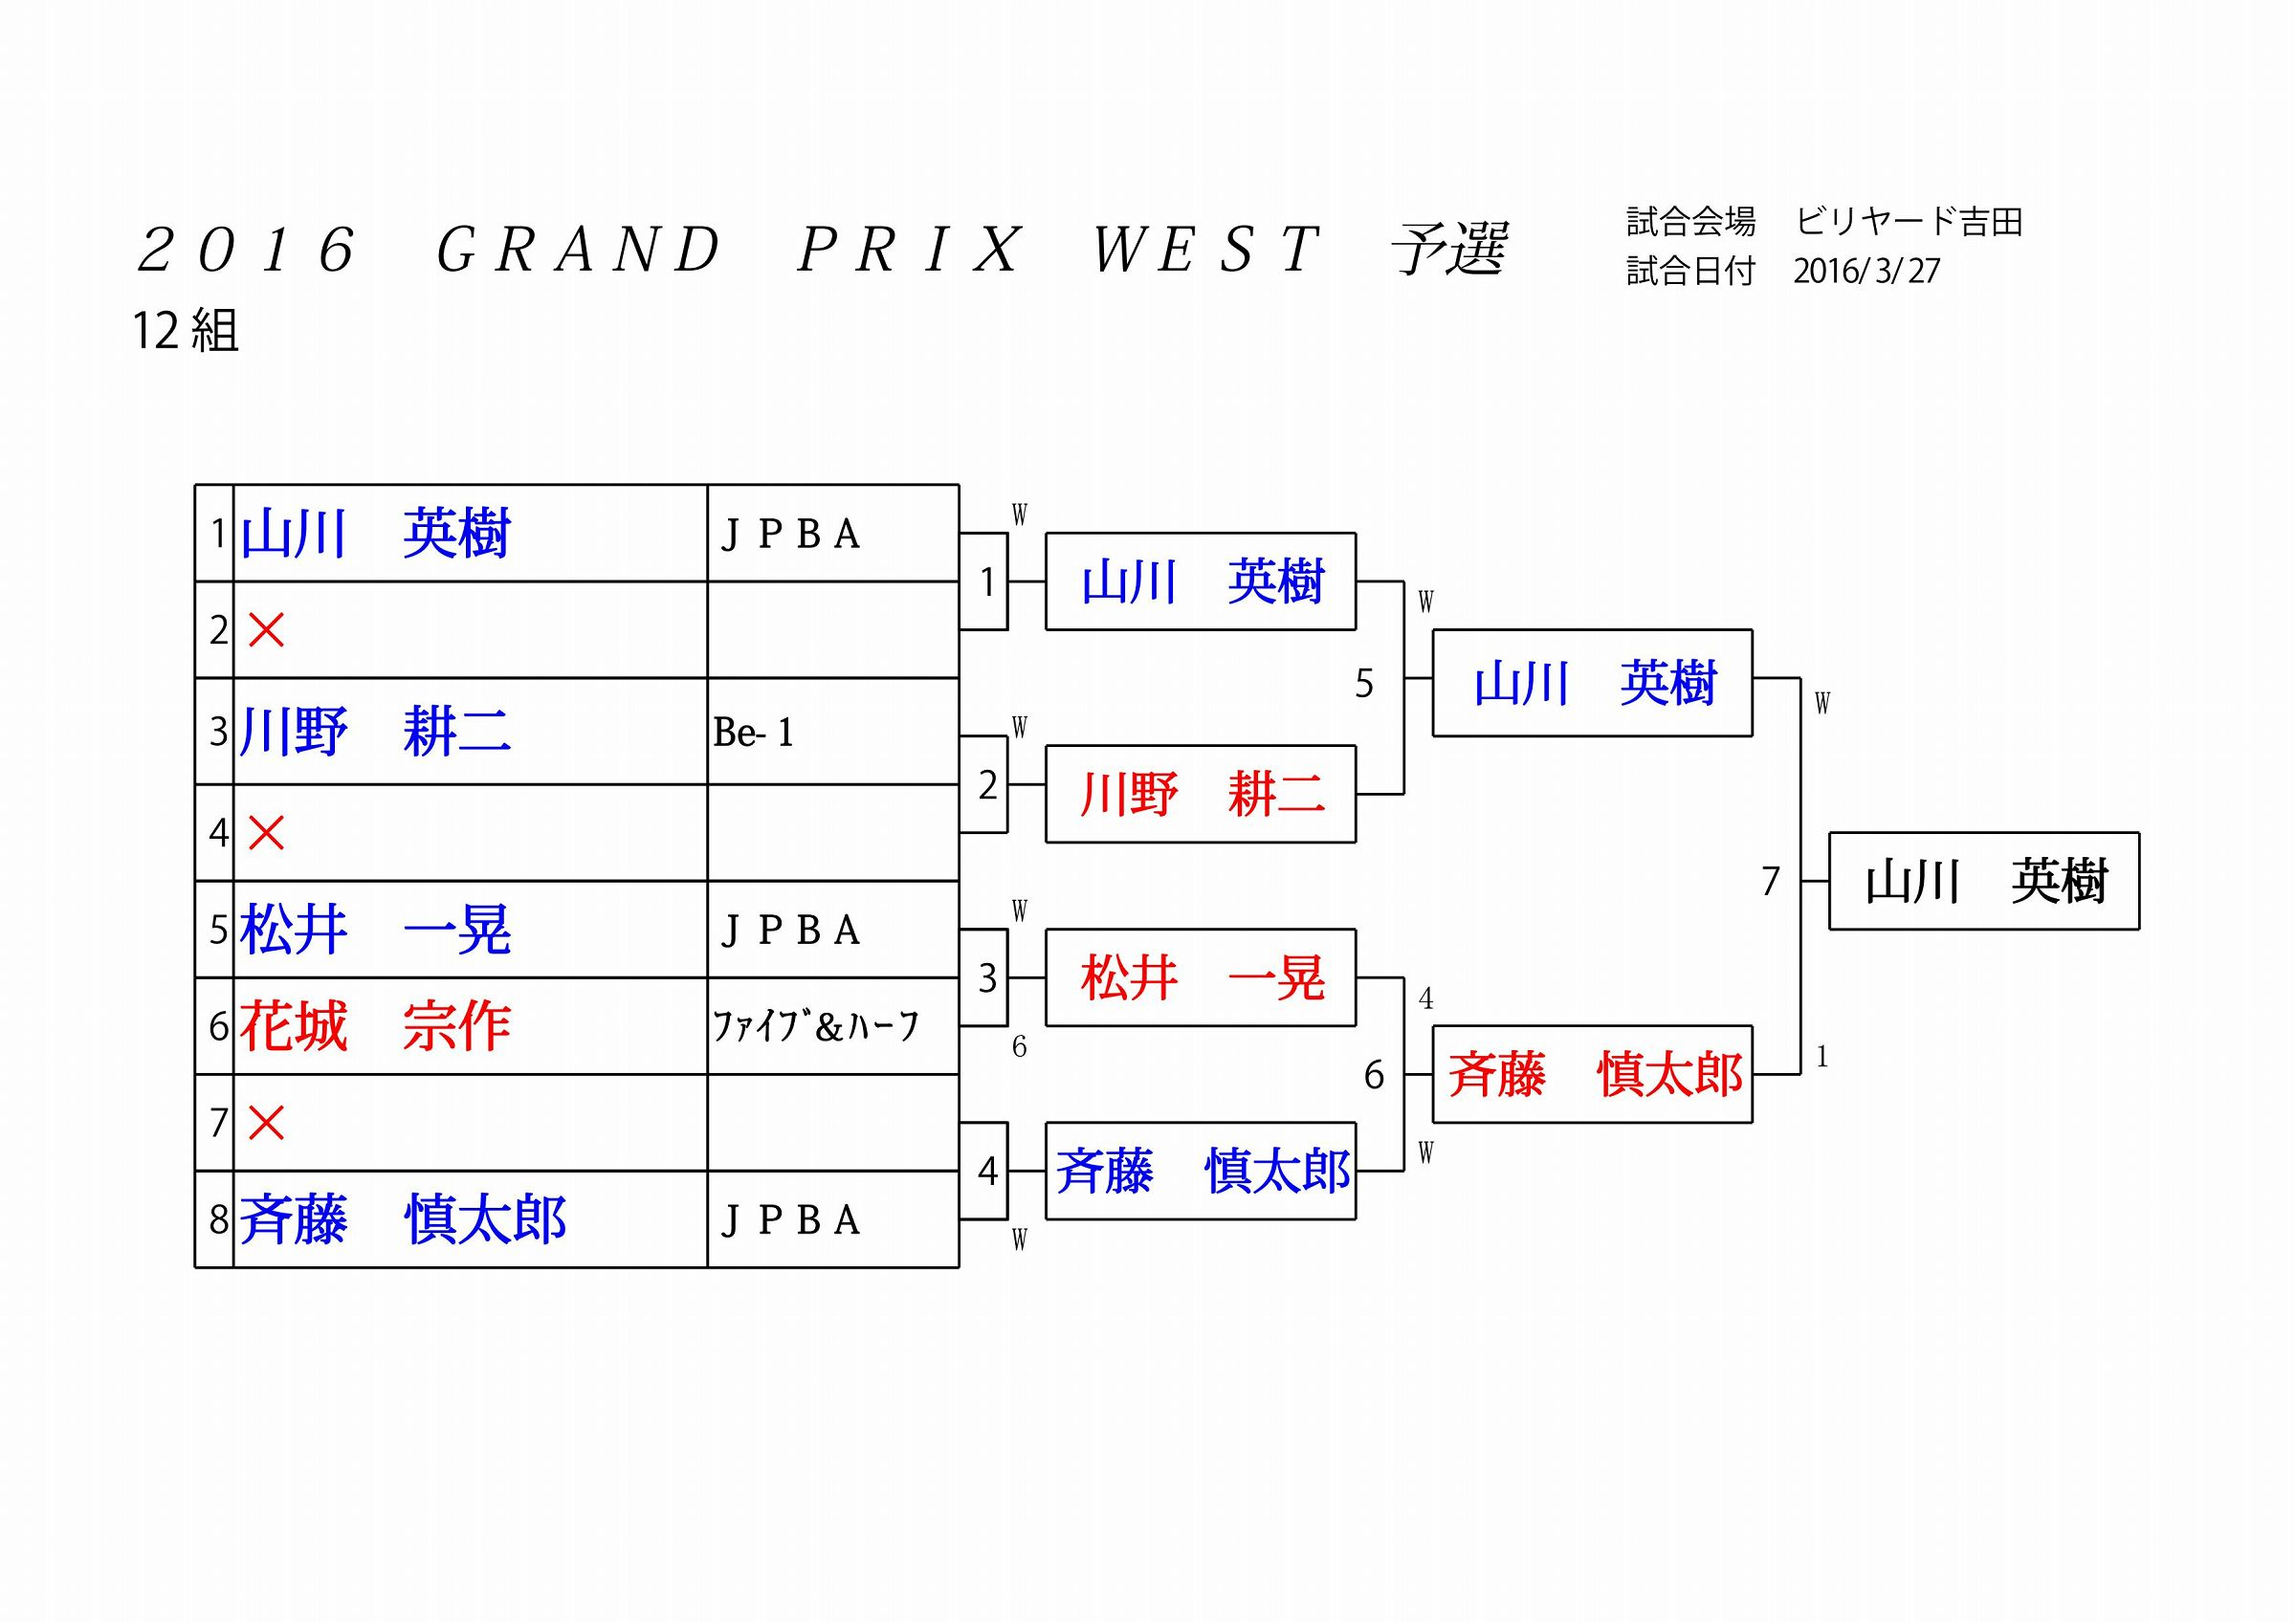 2016 GRAND PRIX WEST 予選_12